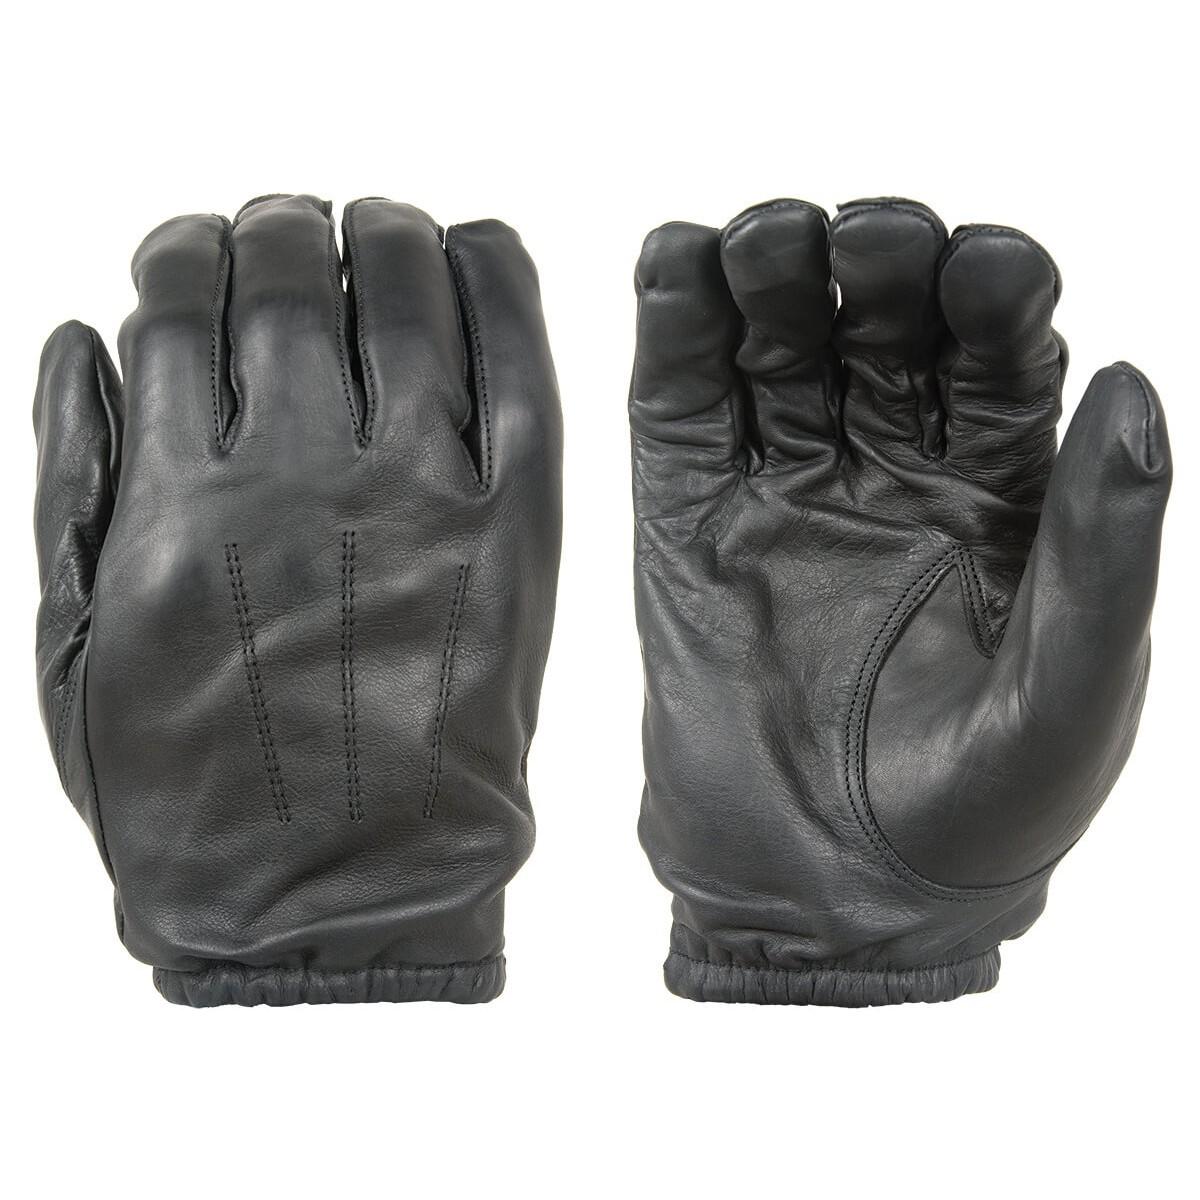 d6ea8745b3cc0 Shop Now Frisker K™ - Leather w/ KEVLAR® liners - Tactical Gloves